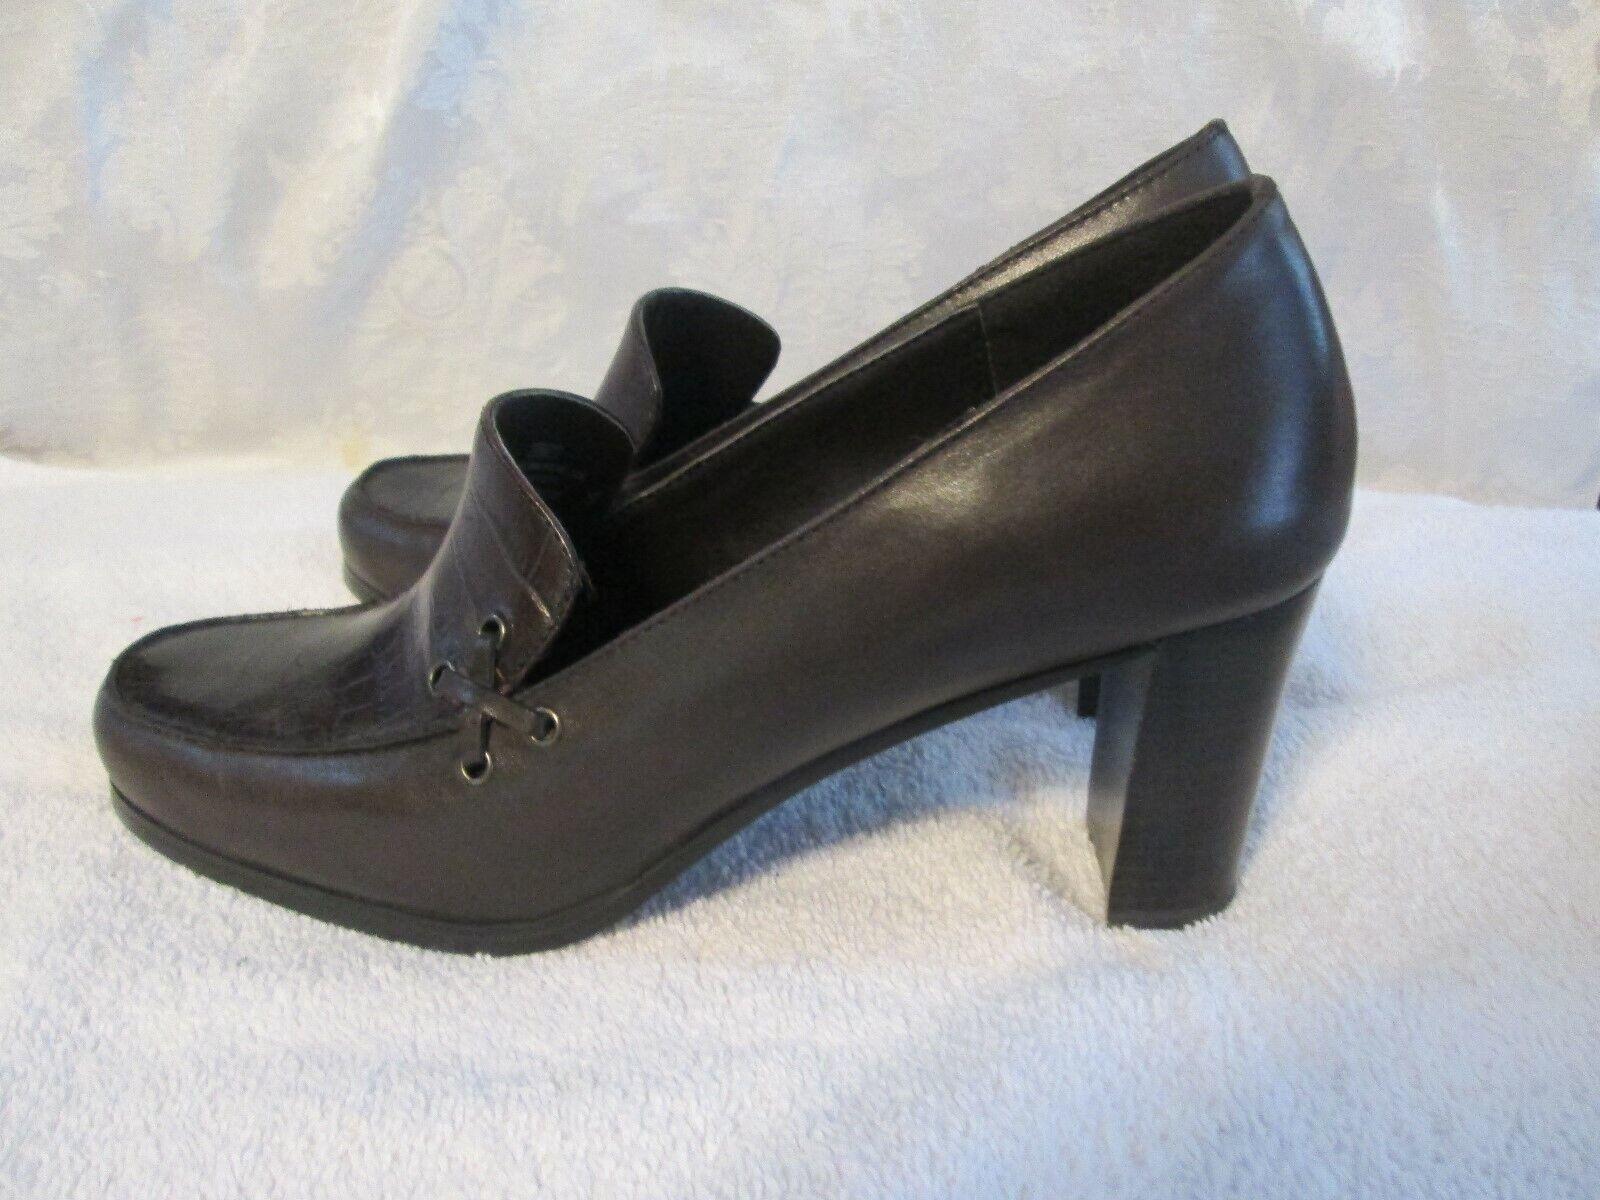 Liz Baker Brown woman's shoes apostrophe 3